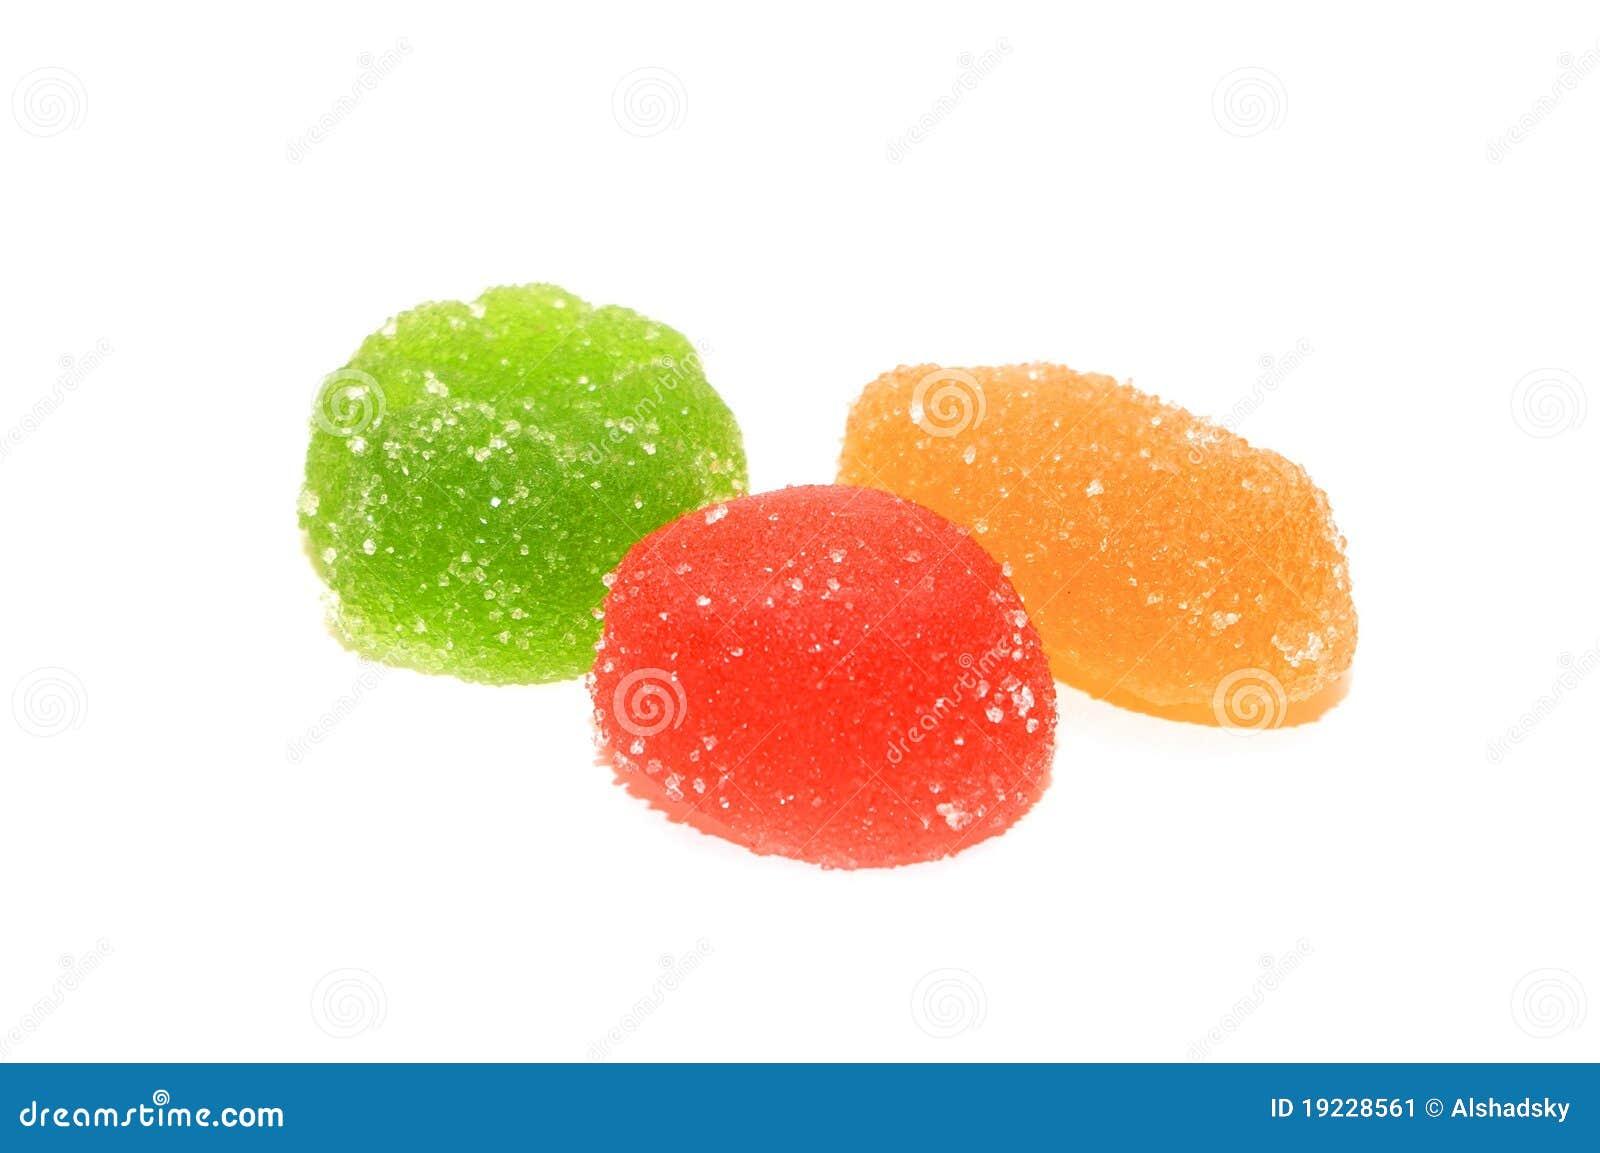 Fruit Jellies Stock Image - Image: 19228561